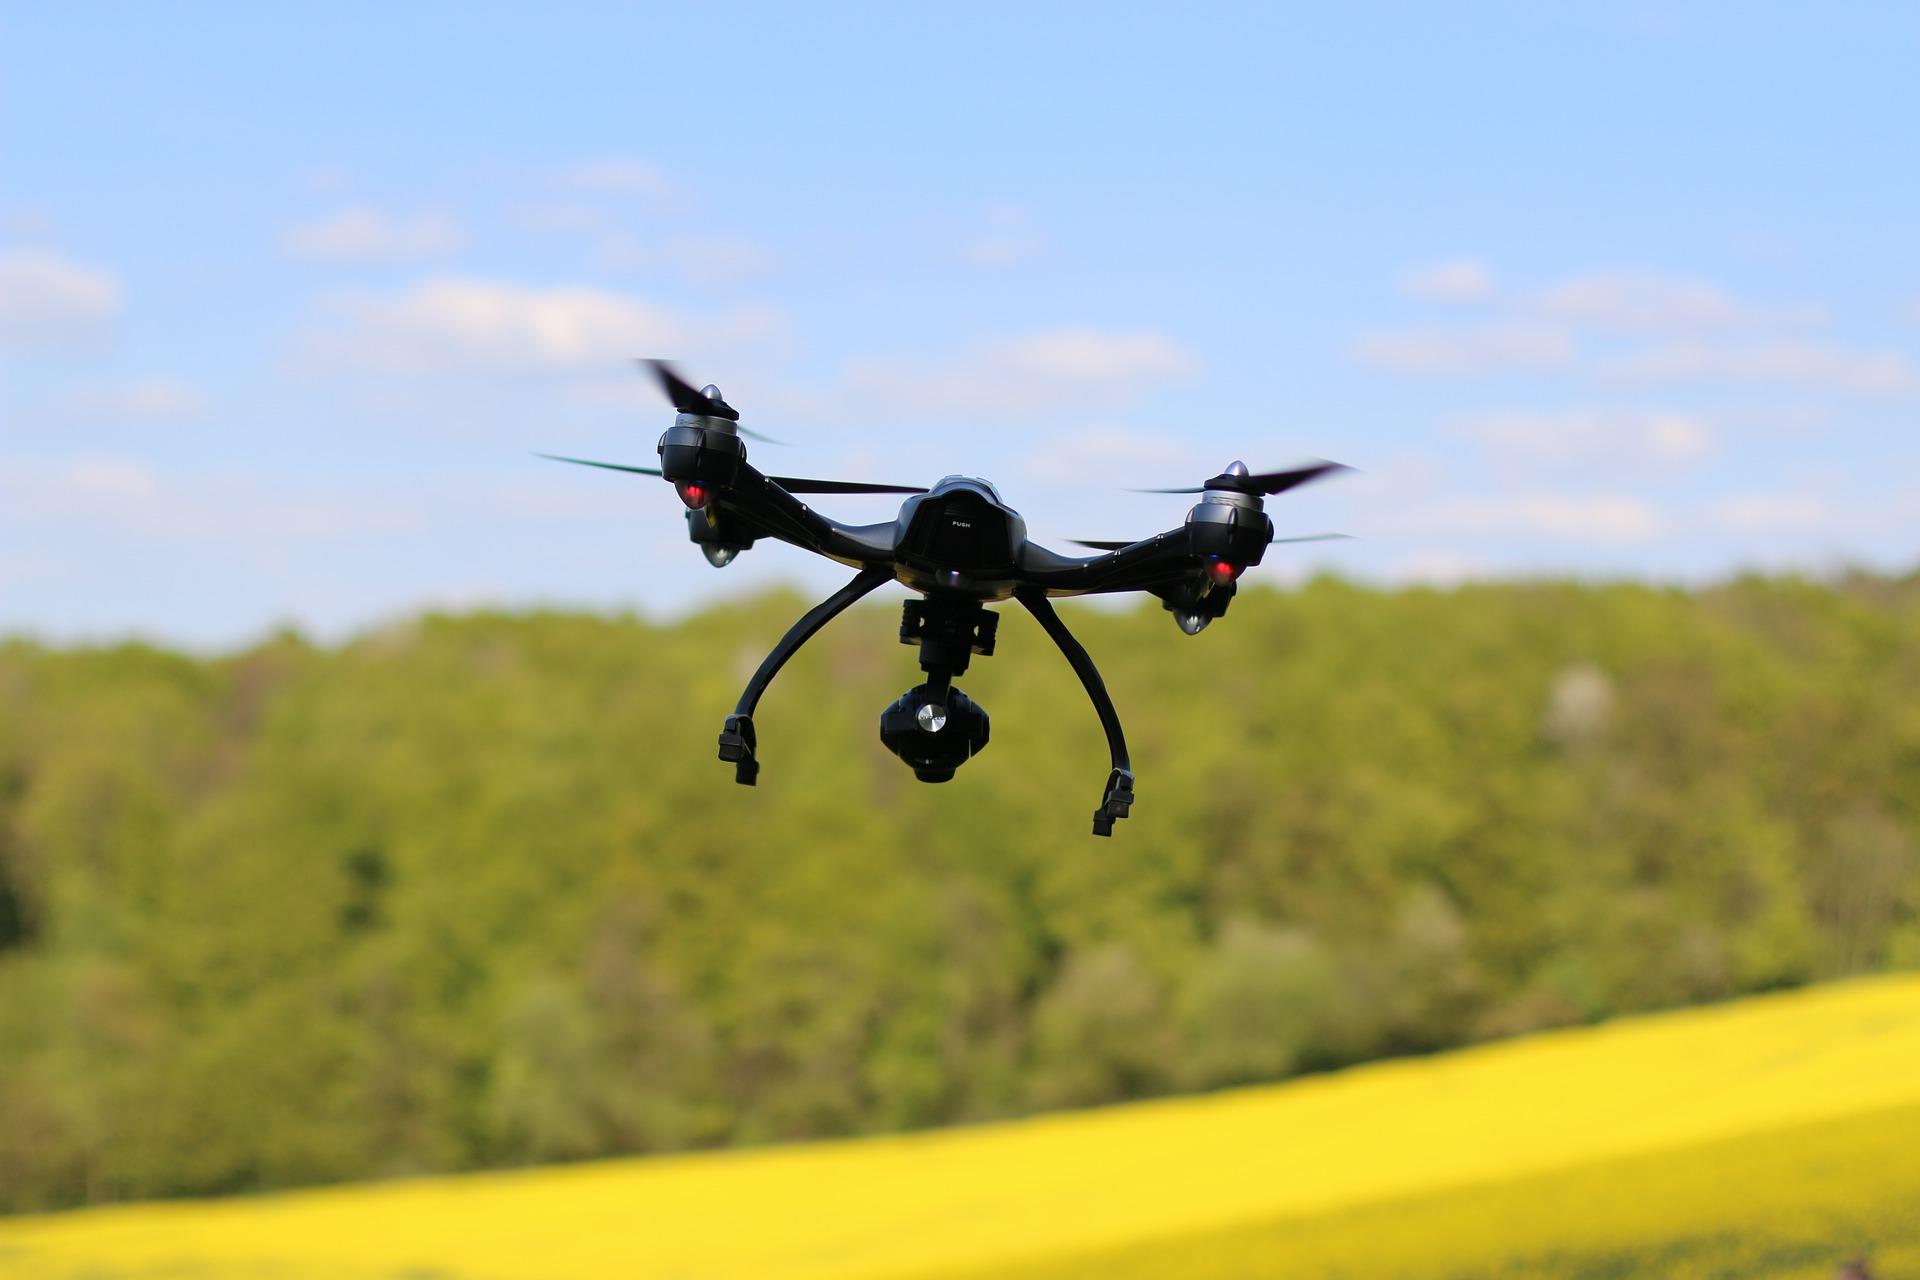 drone-1816506_1920.jpg